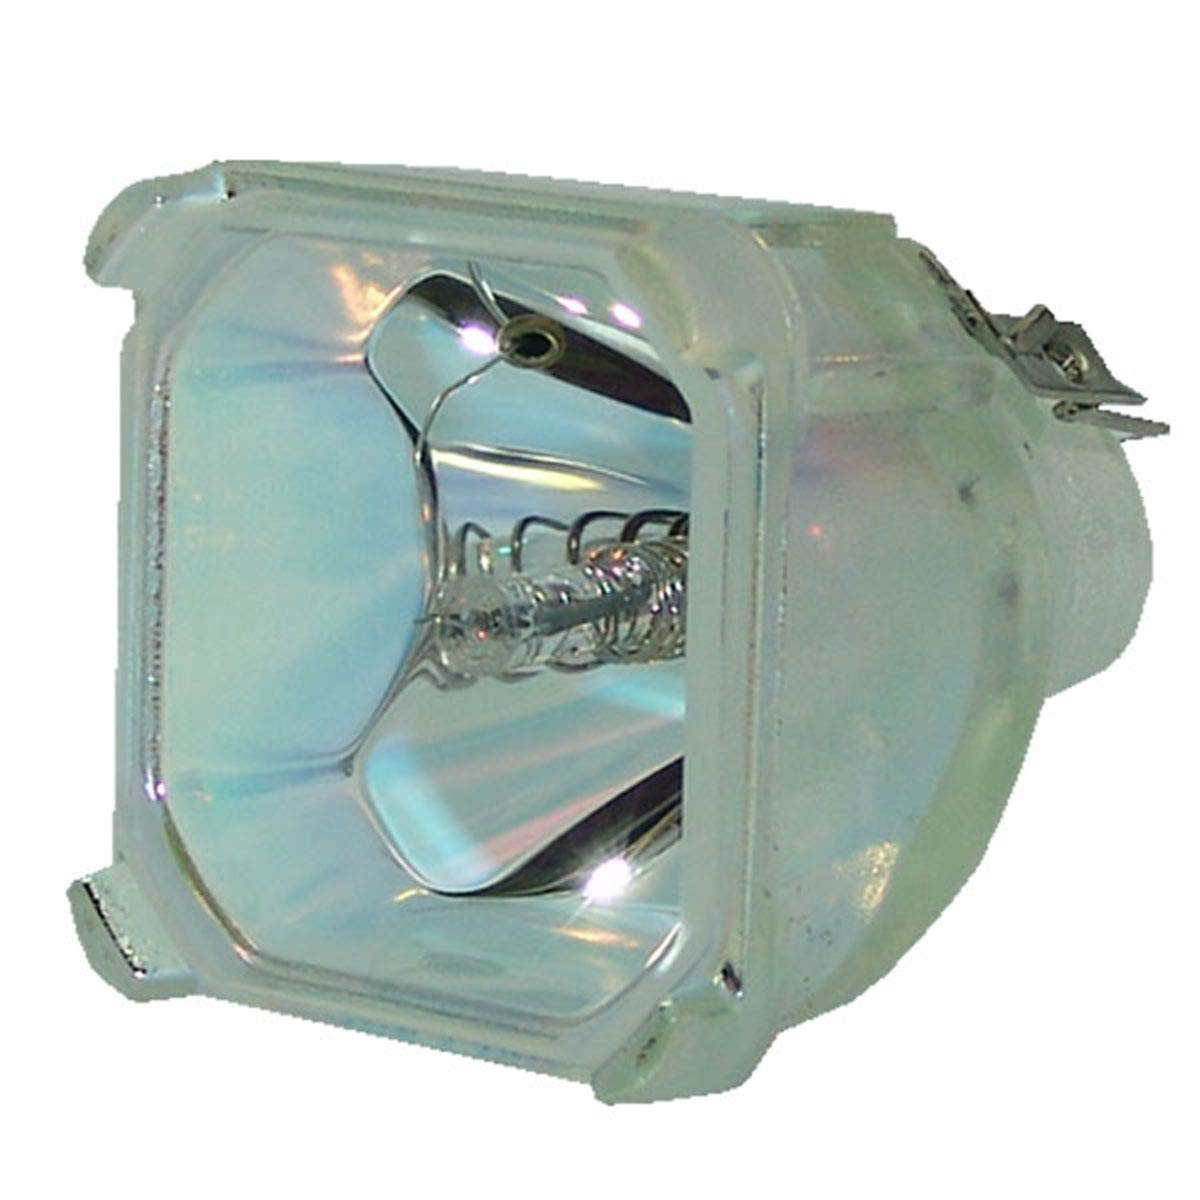 Lutema OEM 交換用ランプ ハウジング/電球付き JVC TS-CL110UAA用 Economy Economy Lamp Only B07KT9TT7W